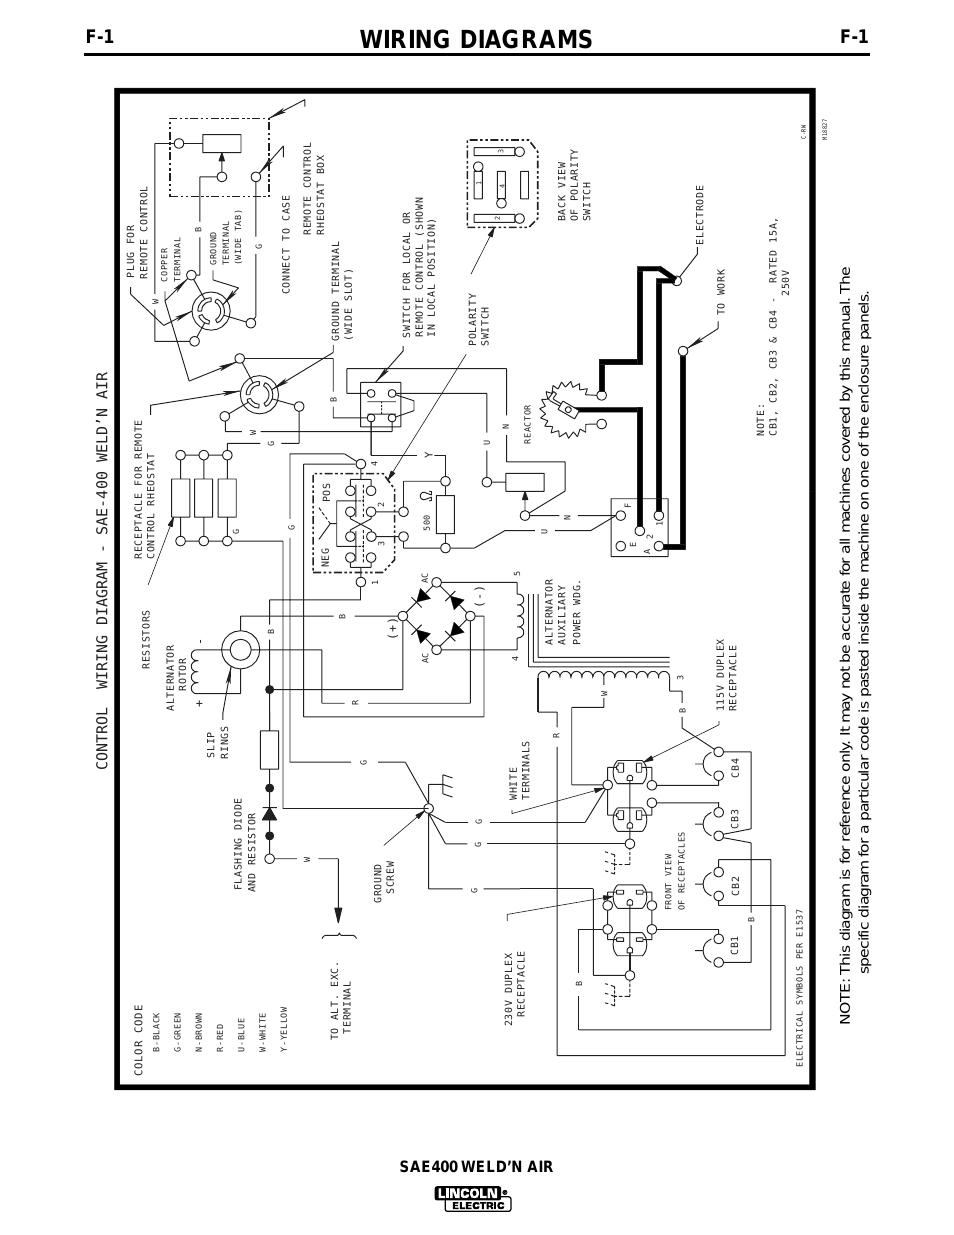 Ts 7794 Engine Parts Diagram On Lincoln 225 Welder Generator Wiring Diagram Wiring Diagram